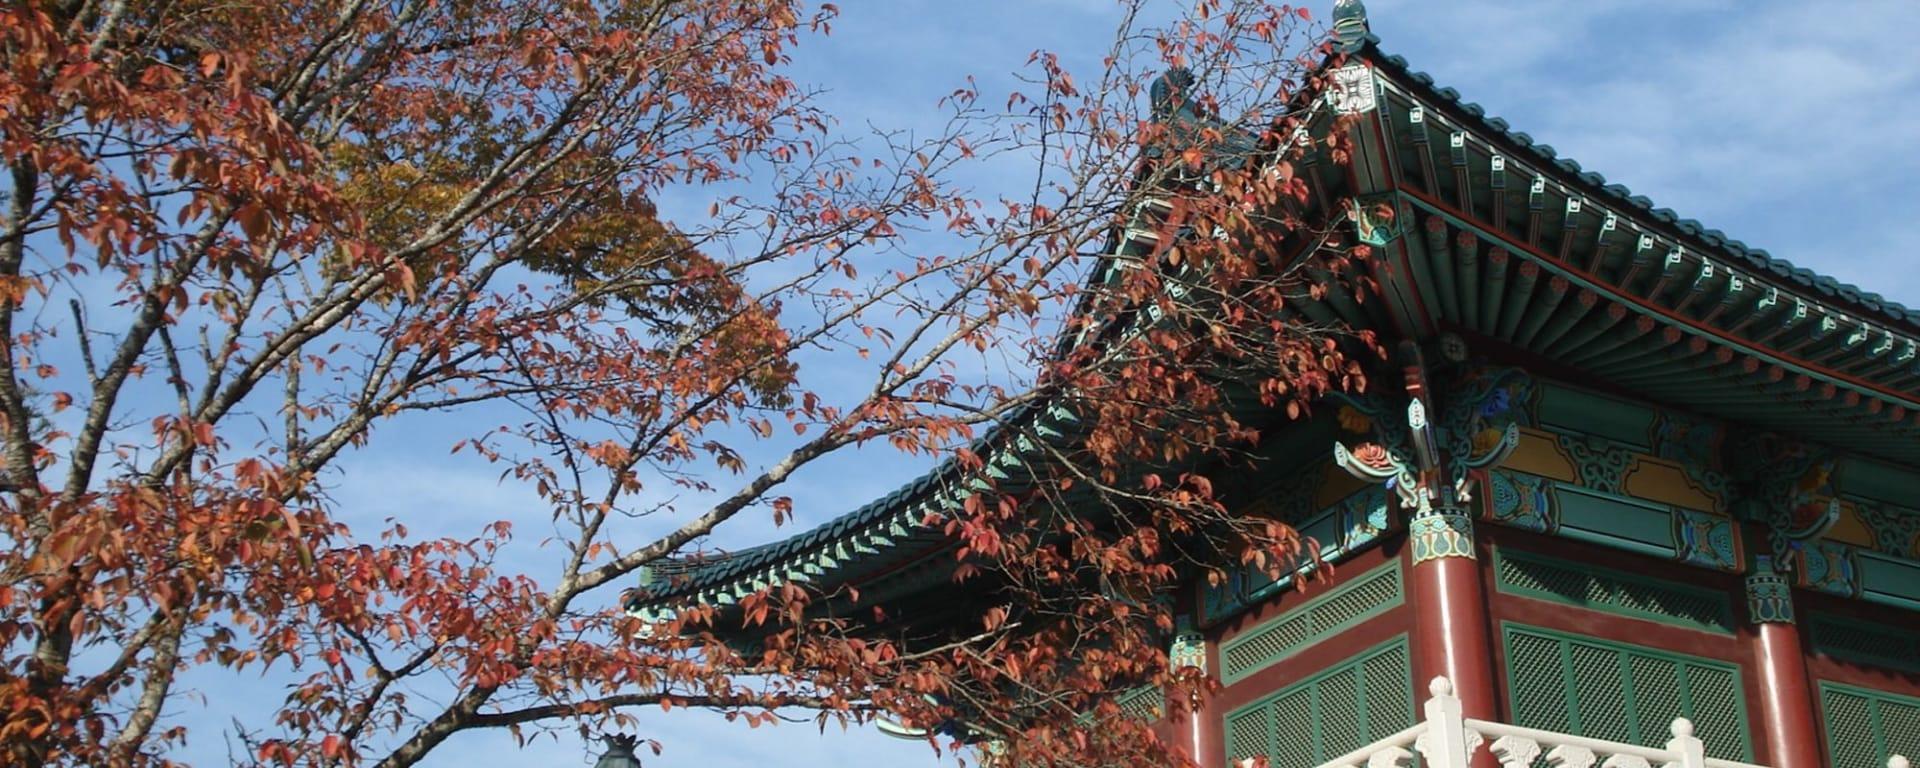 Stadtrundfahrt Seoul: Südkorea (1)